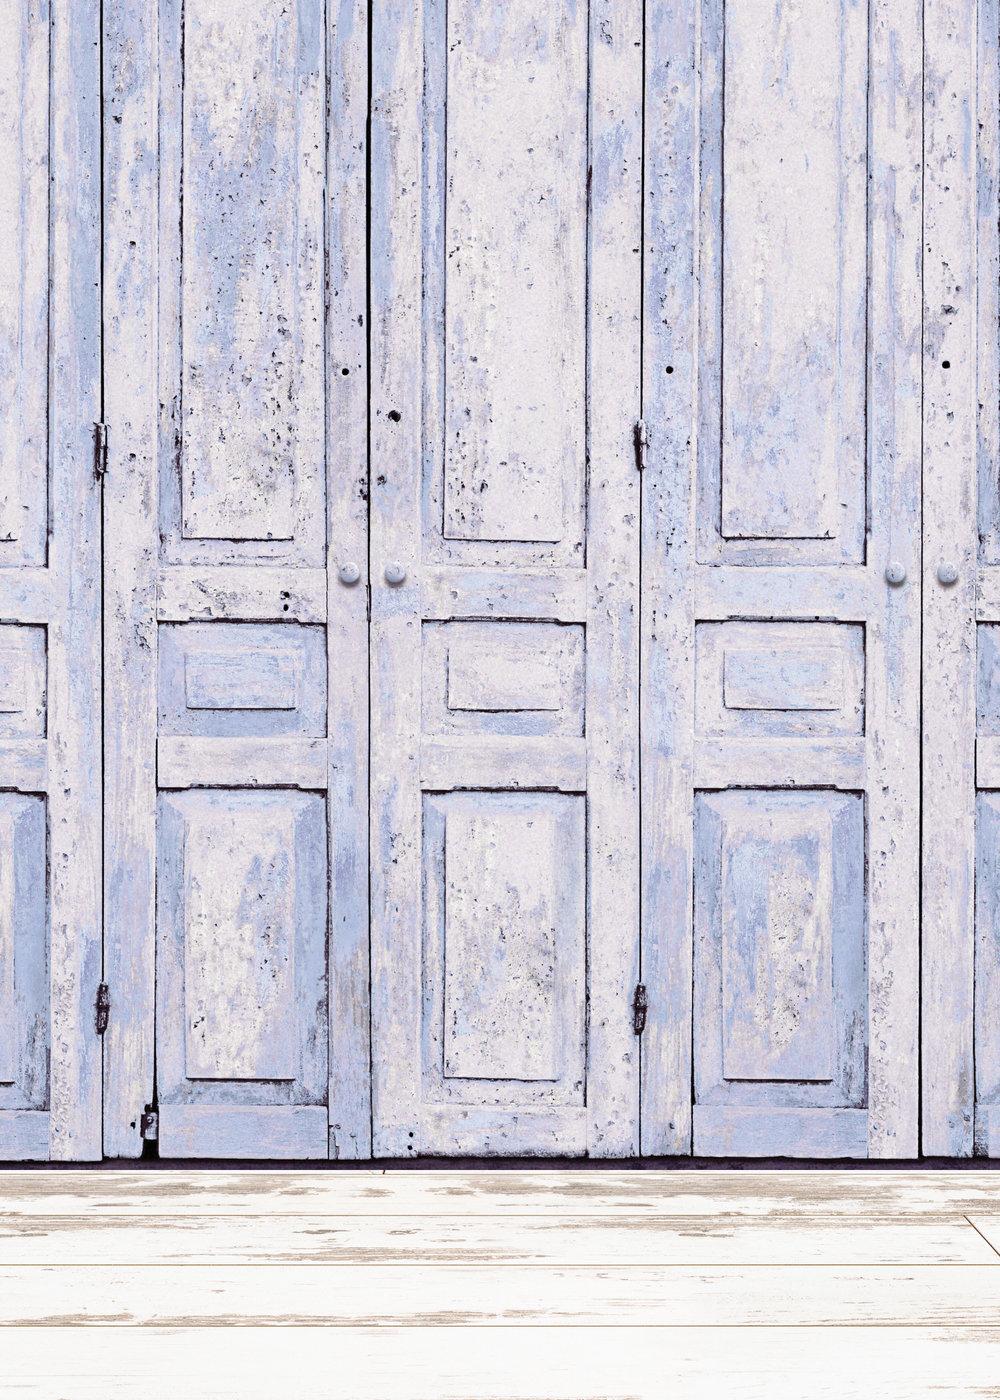 Background Q - Blue Doors